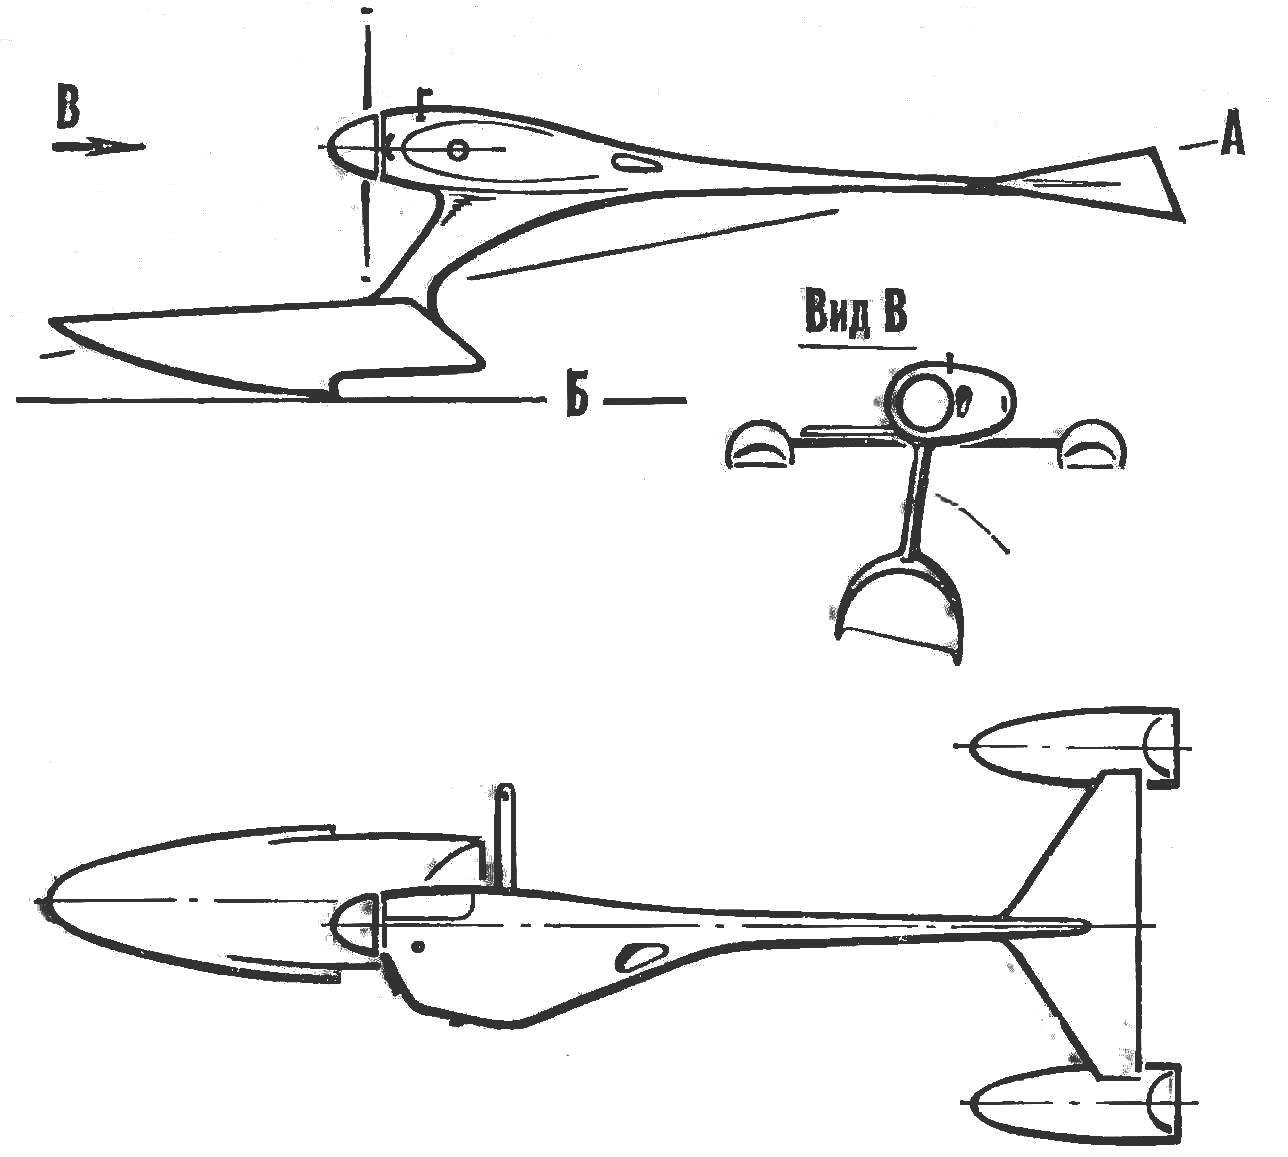 Fig. 1. Cord model aerolaser new scheme